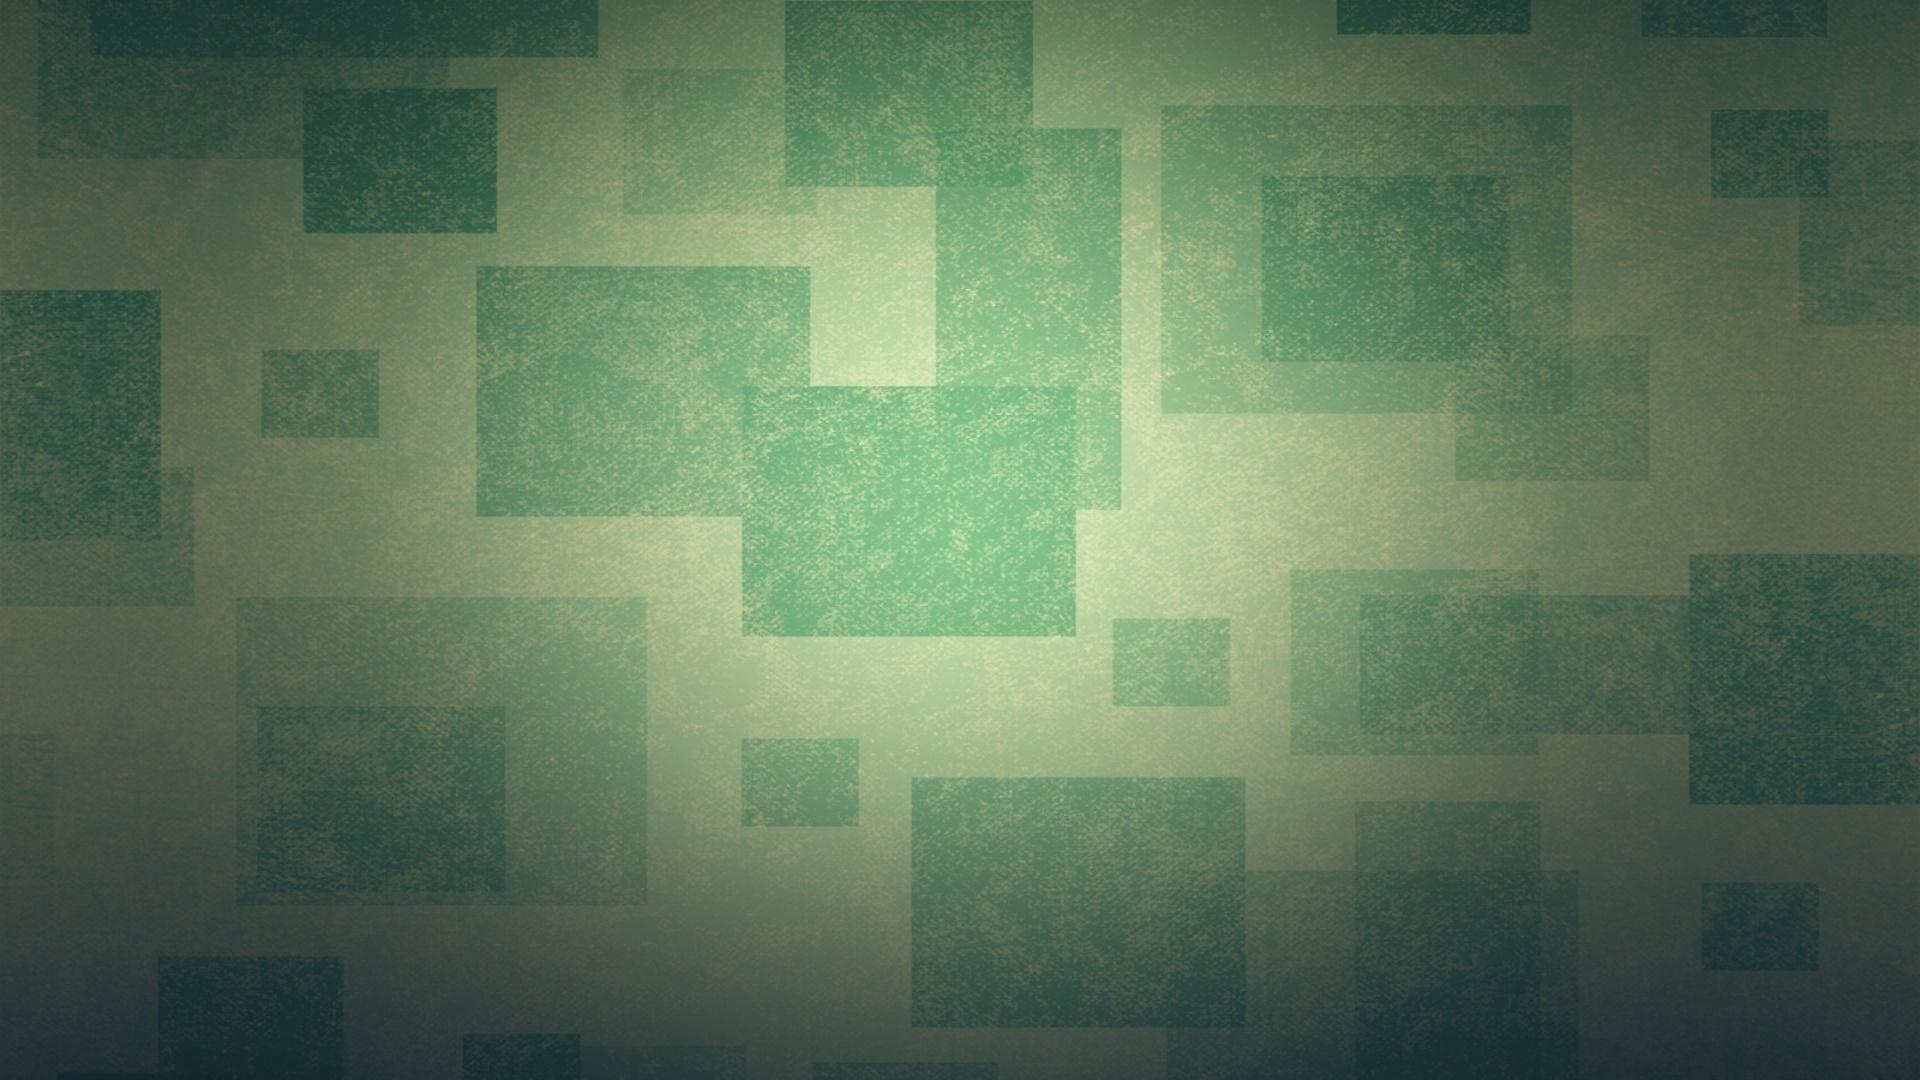 Best Quotes Hd Wallpaper Free Download Abstract Texture Wallpapers Hd Pixelstalk Net